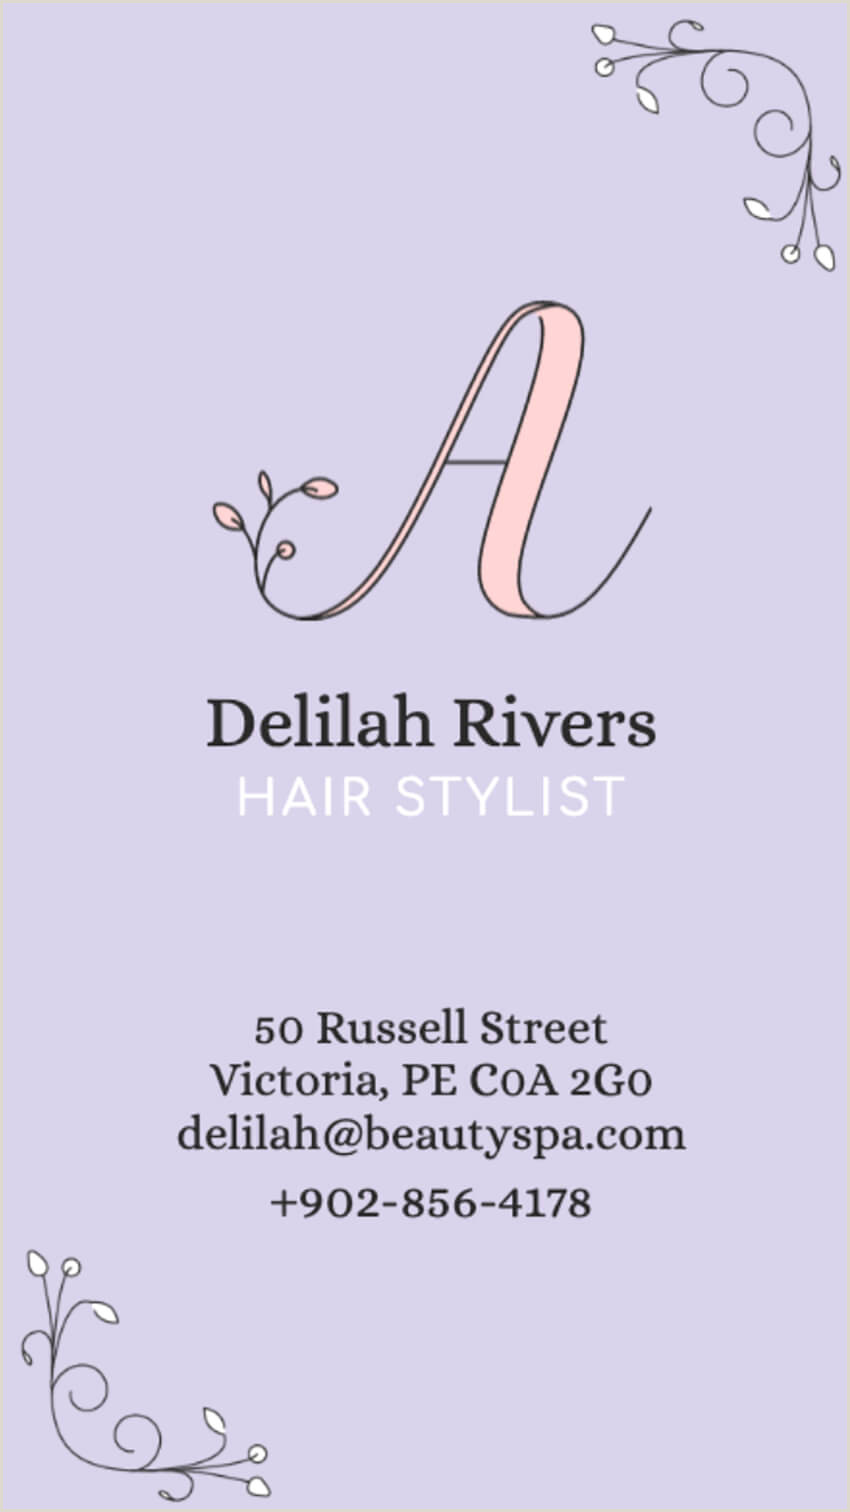 Cool Business Card Designs 2015 25 Cool Business Card Designs Creative Inspiration Ideas